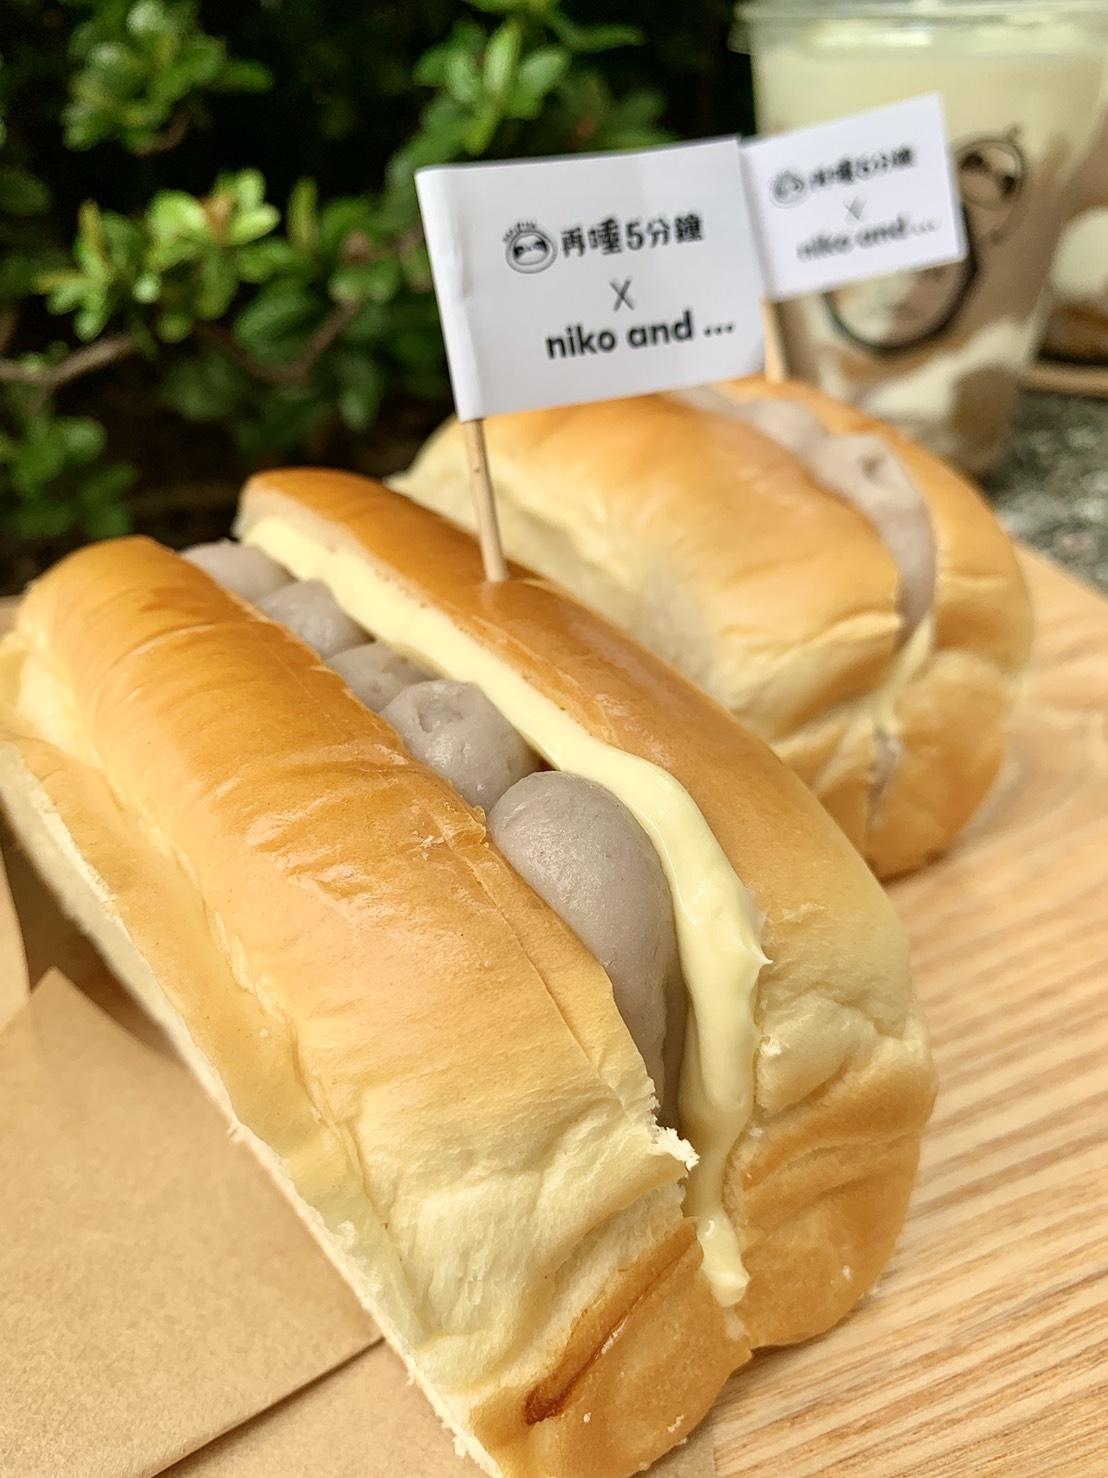 niko and...聯手人氣手搖「再睡5分鐘」 推出芋泥新品!「黑糖香芋啵啵、鹹奶油芋泥麵包」限量開賣